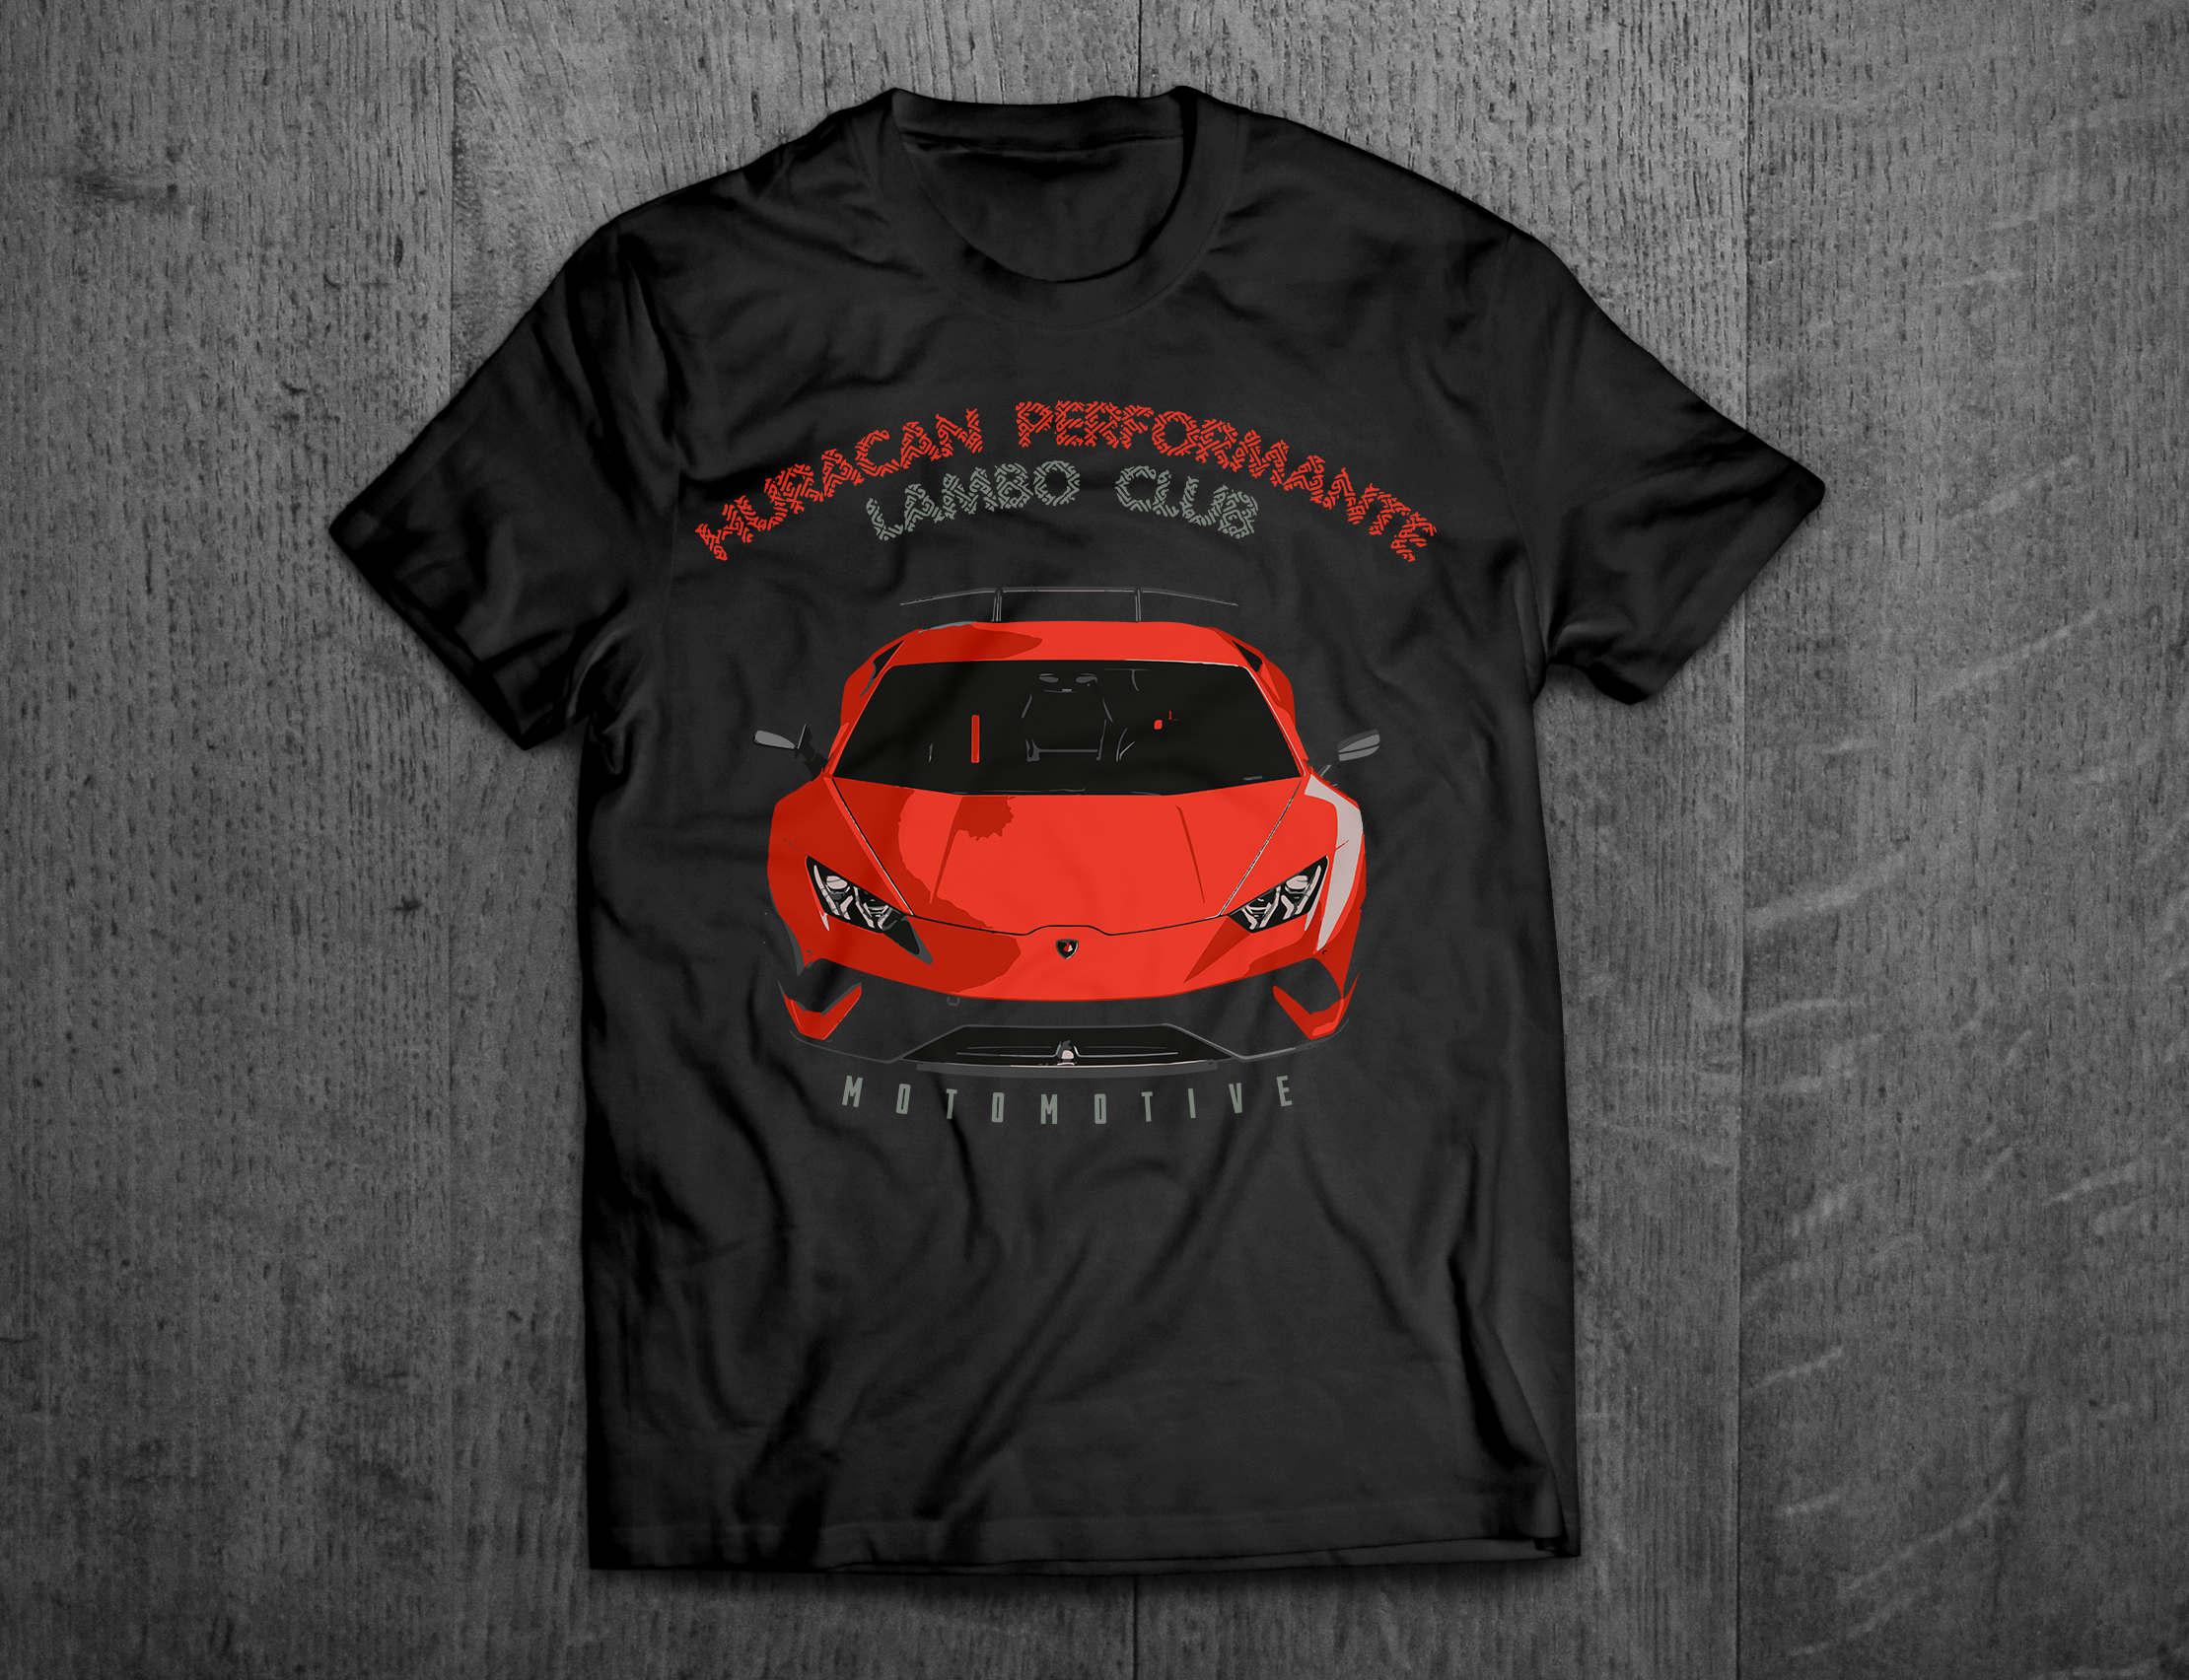 Lamborghini Shirts Lambo T Shirts Lambo Huracan T Shirts Men